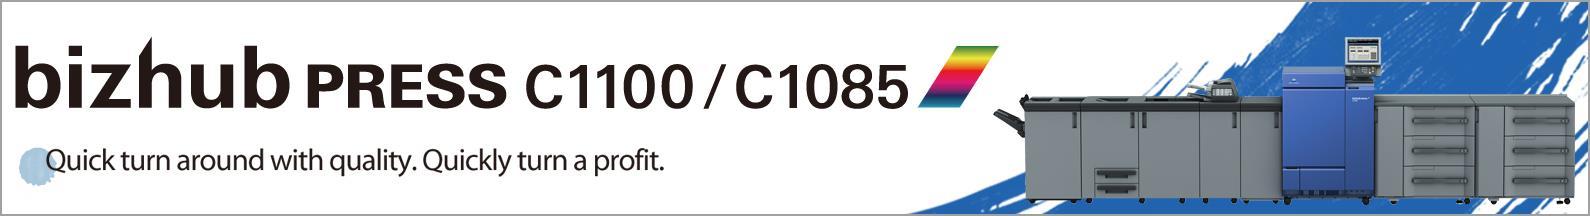 Konica Minolta BisHub C1100